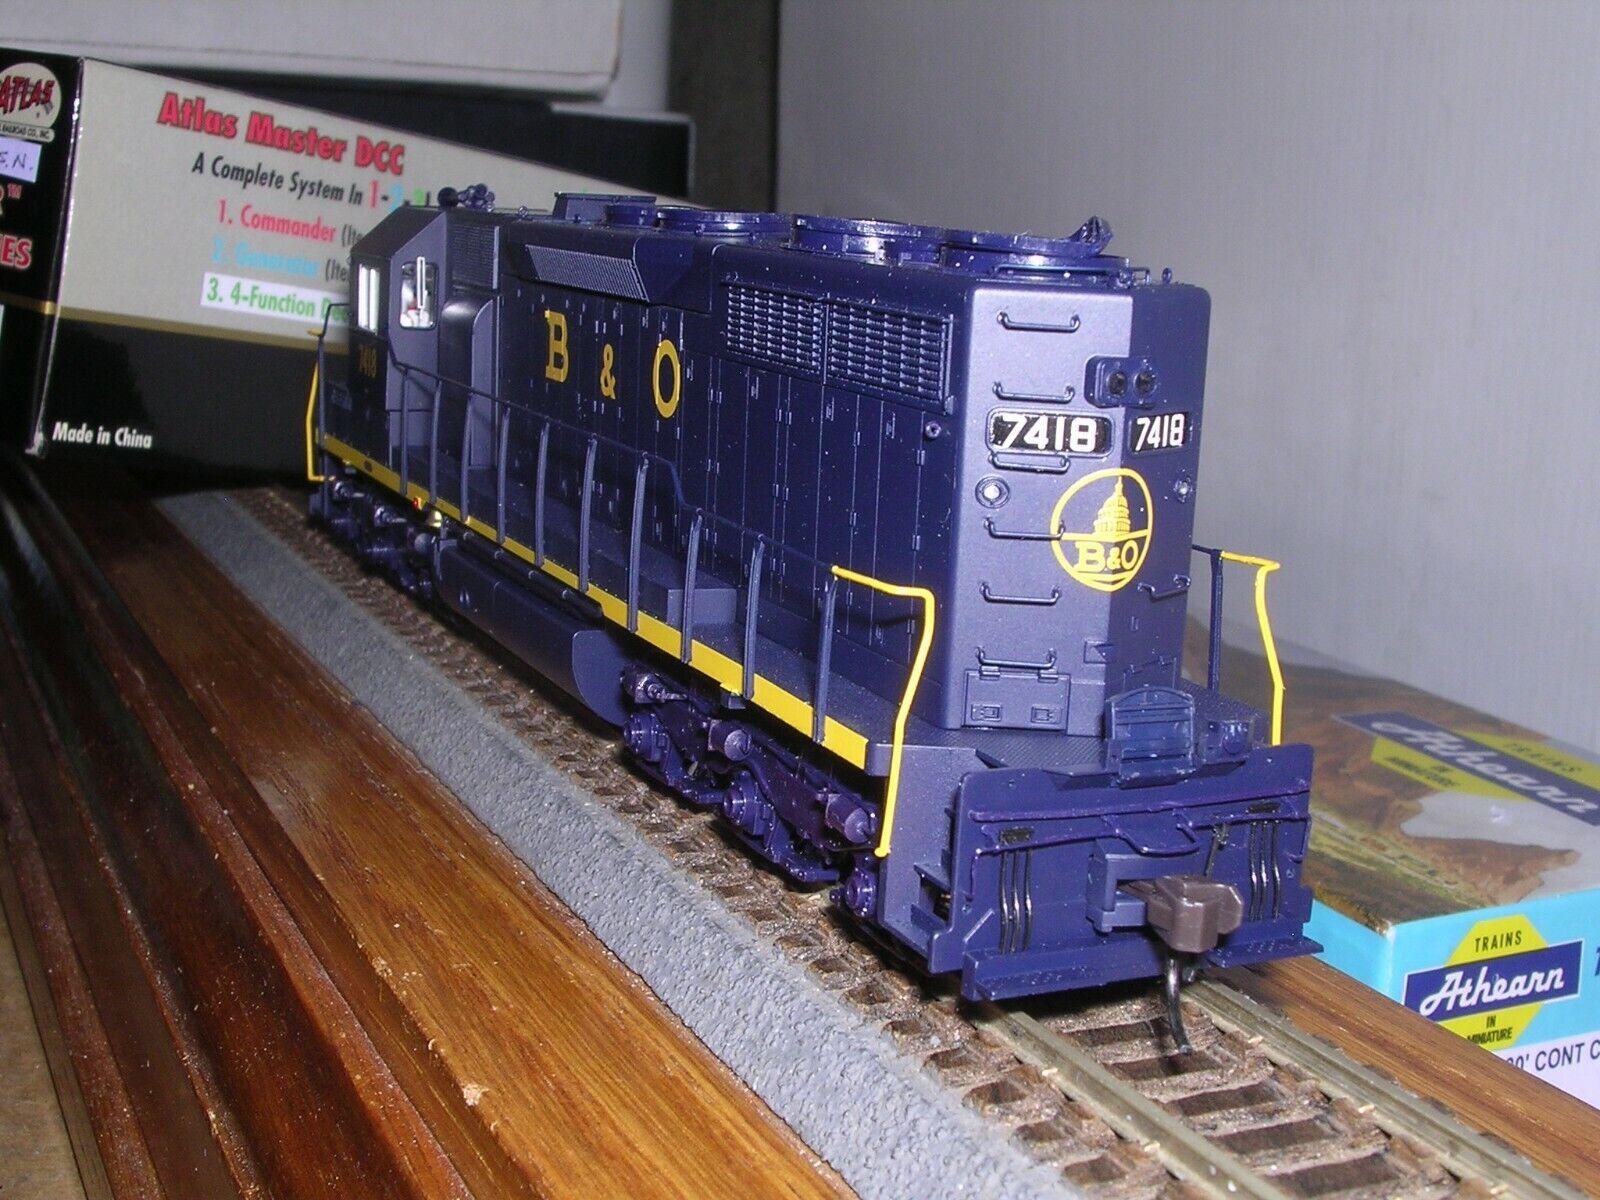 ATLAS  9227  Baltimore & Ohio EMD SD-35 Low Nose Diesel Loco  7418  H.O. 1 87